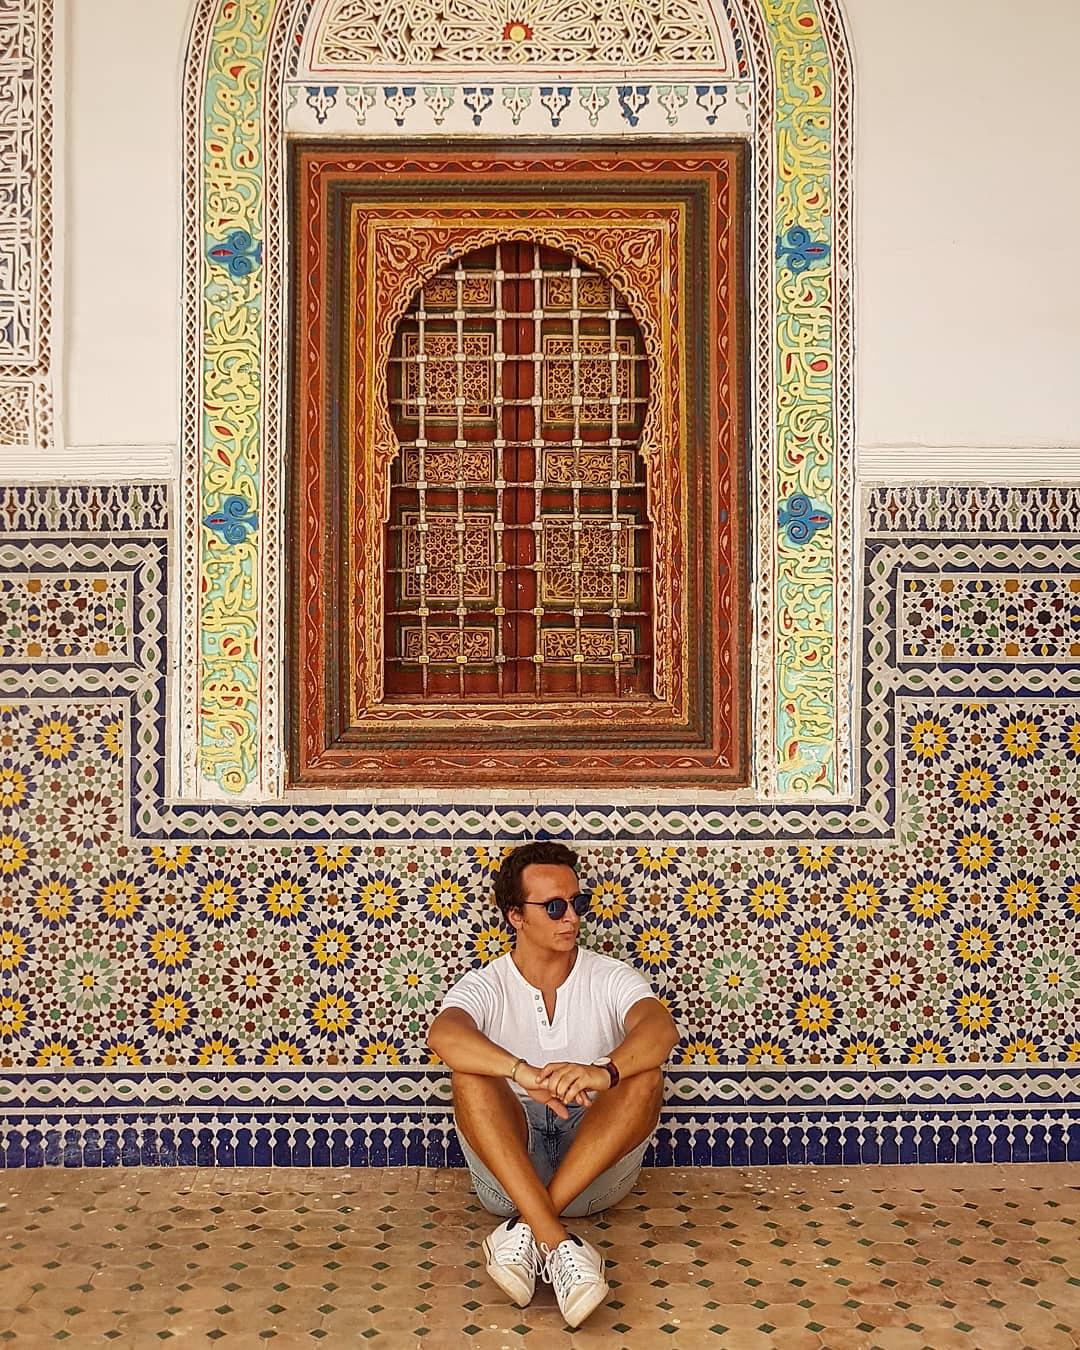 Woobii team land on Morocco